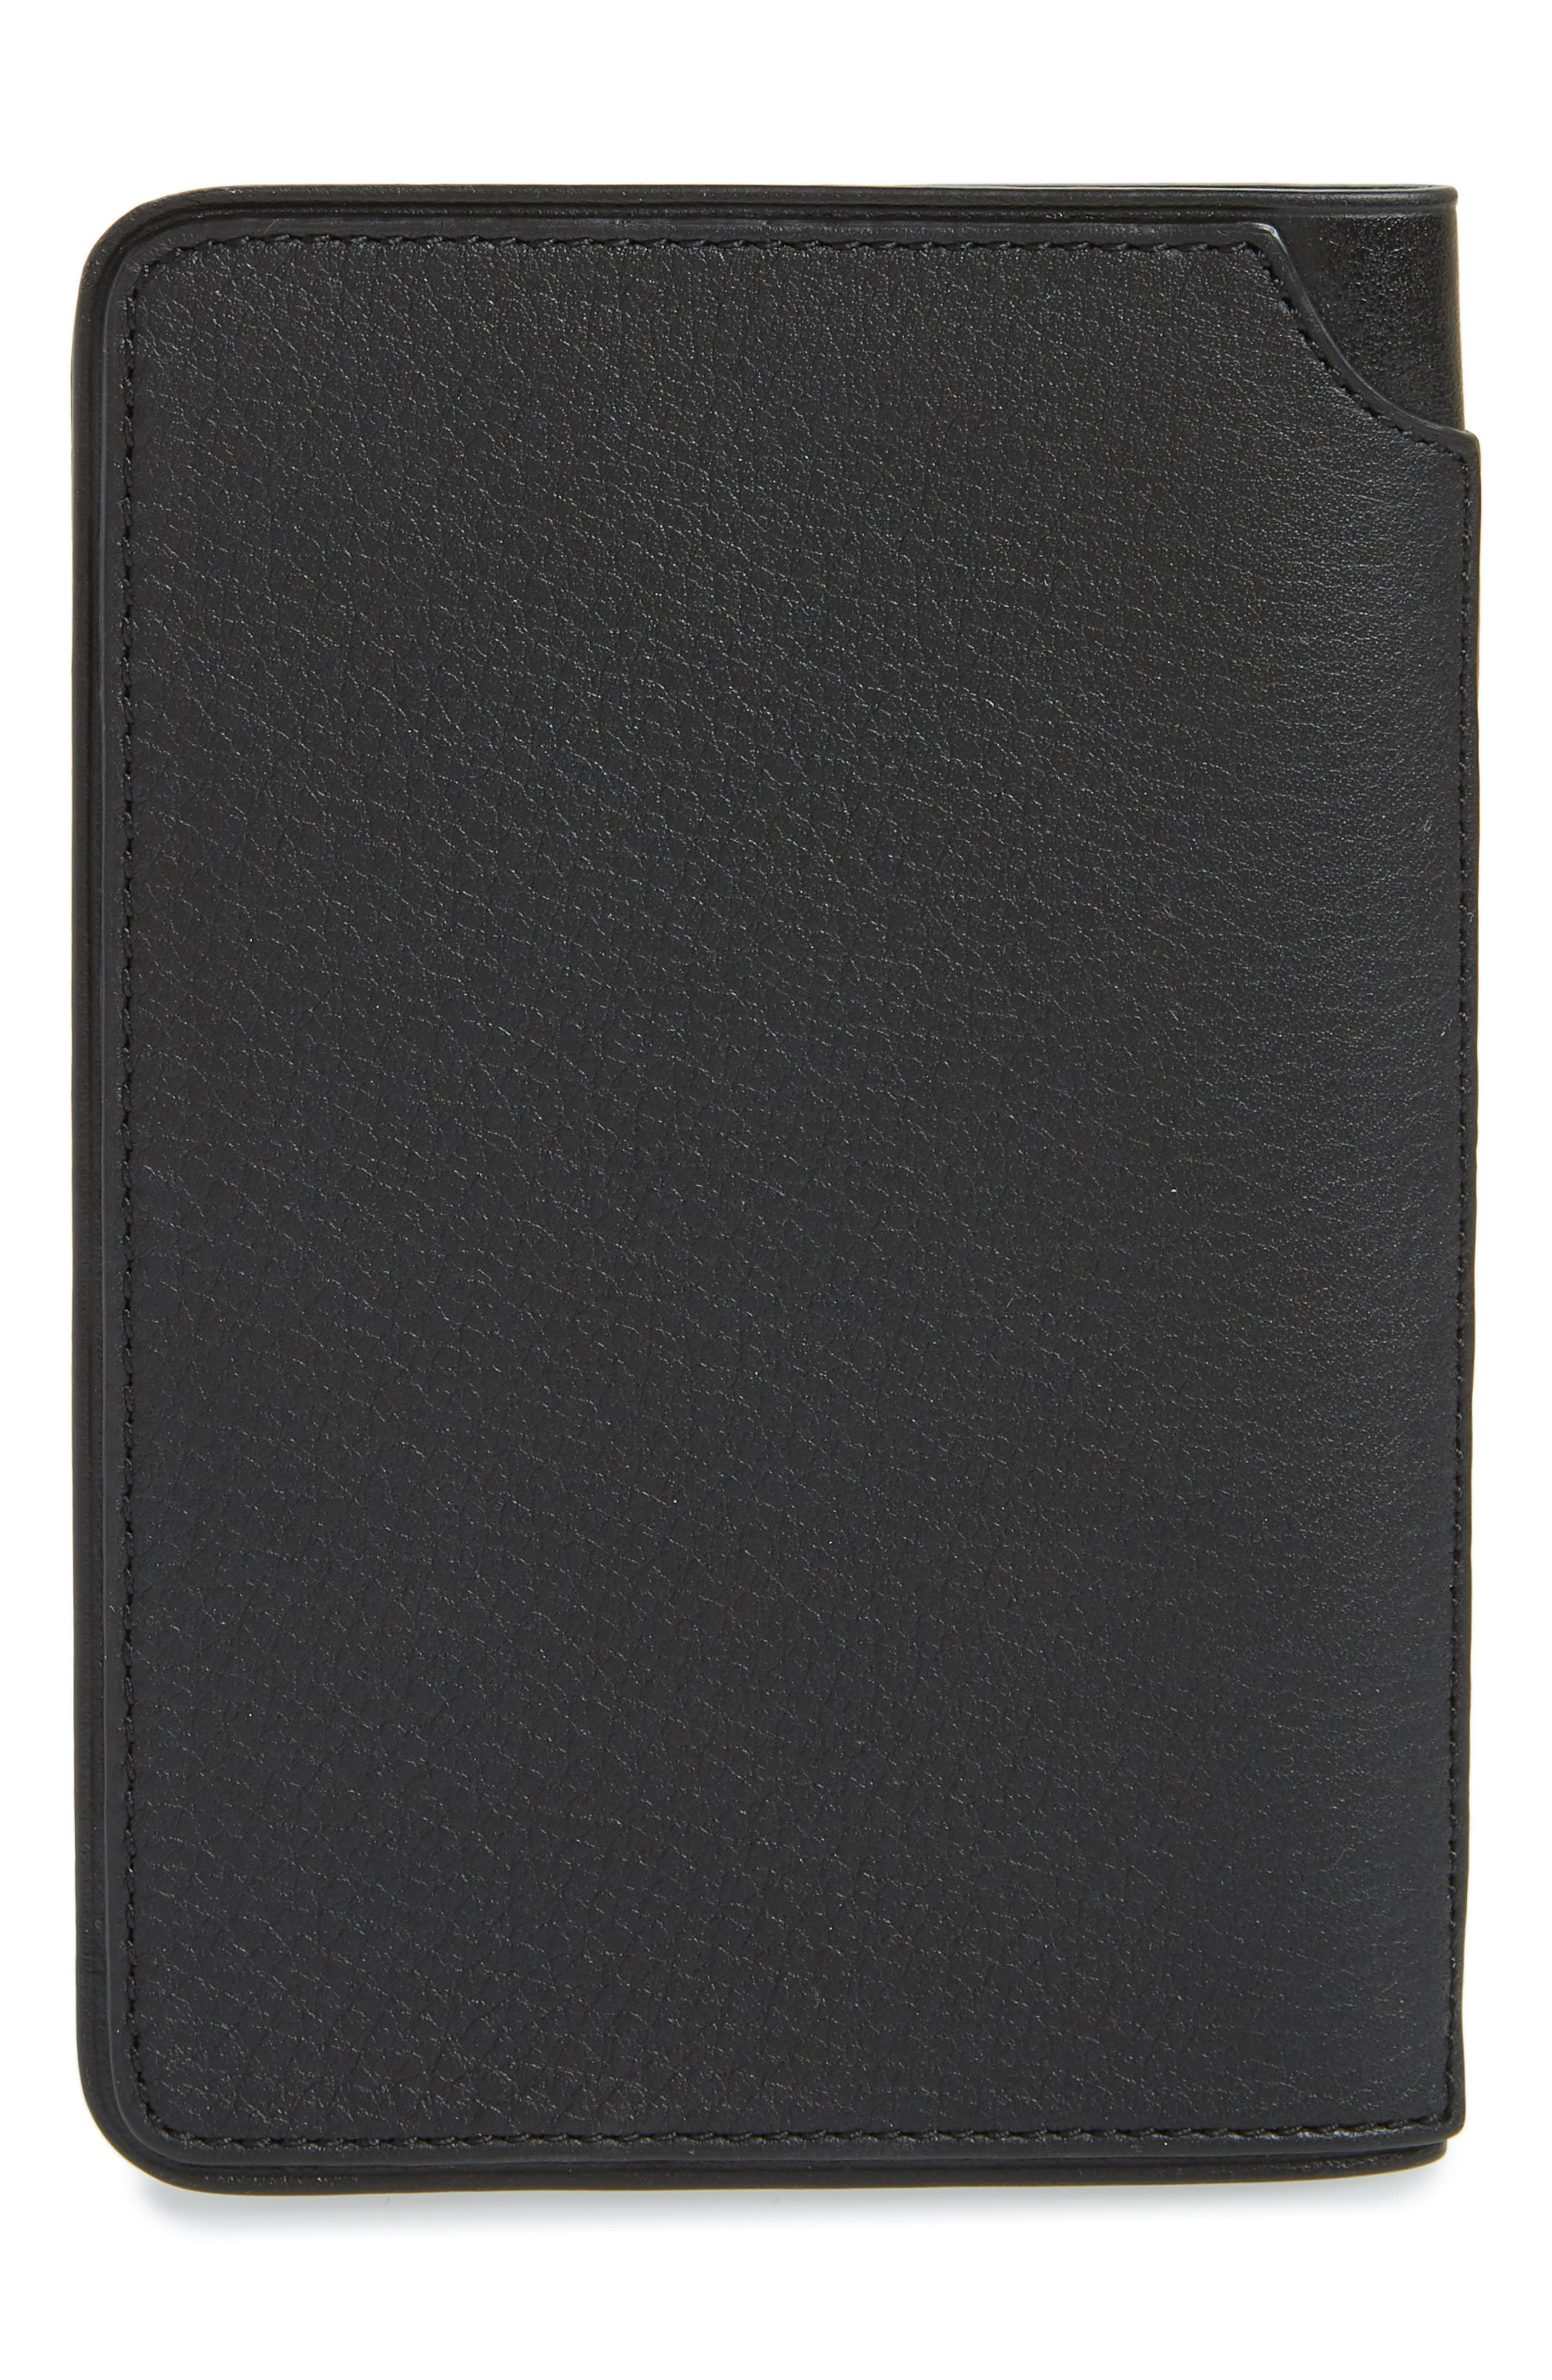 Leather Passport Holder,                             Alternate thumbnail 4, color,                             001